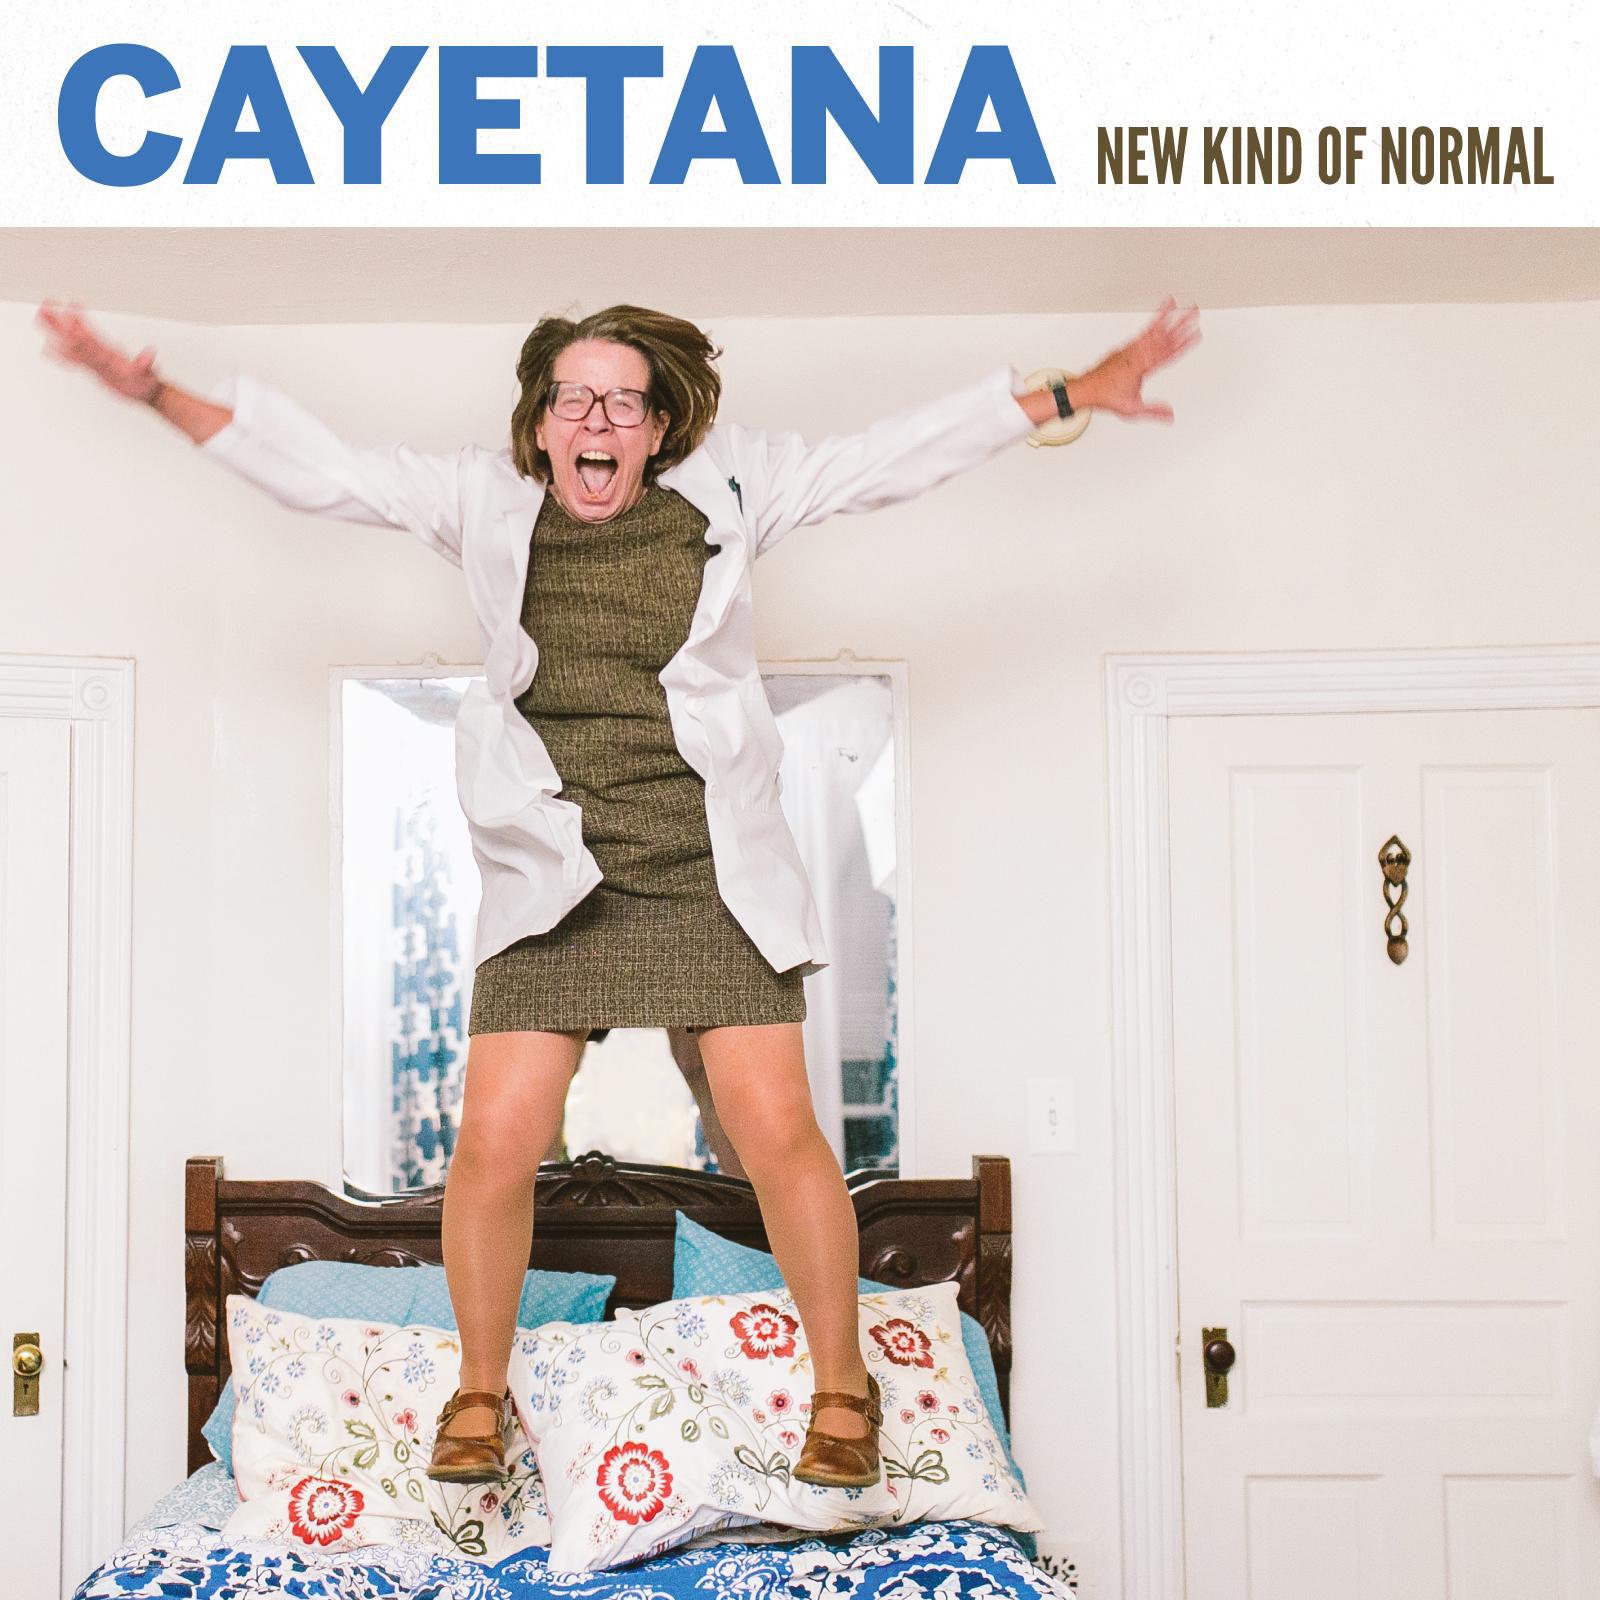 Cayetana New Kind of Normal.jpg